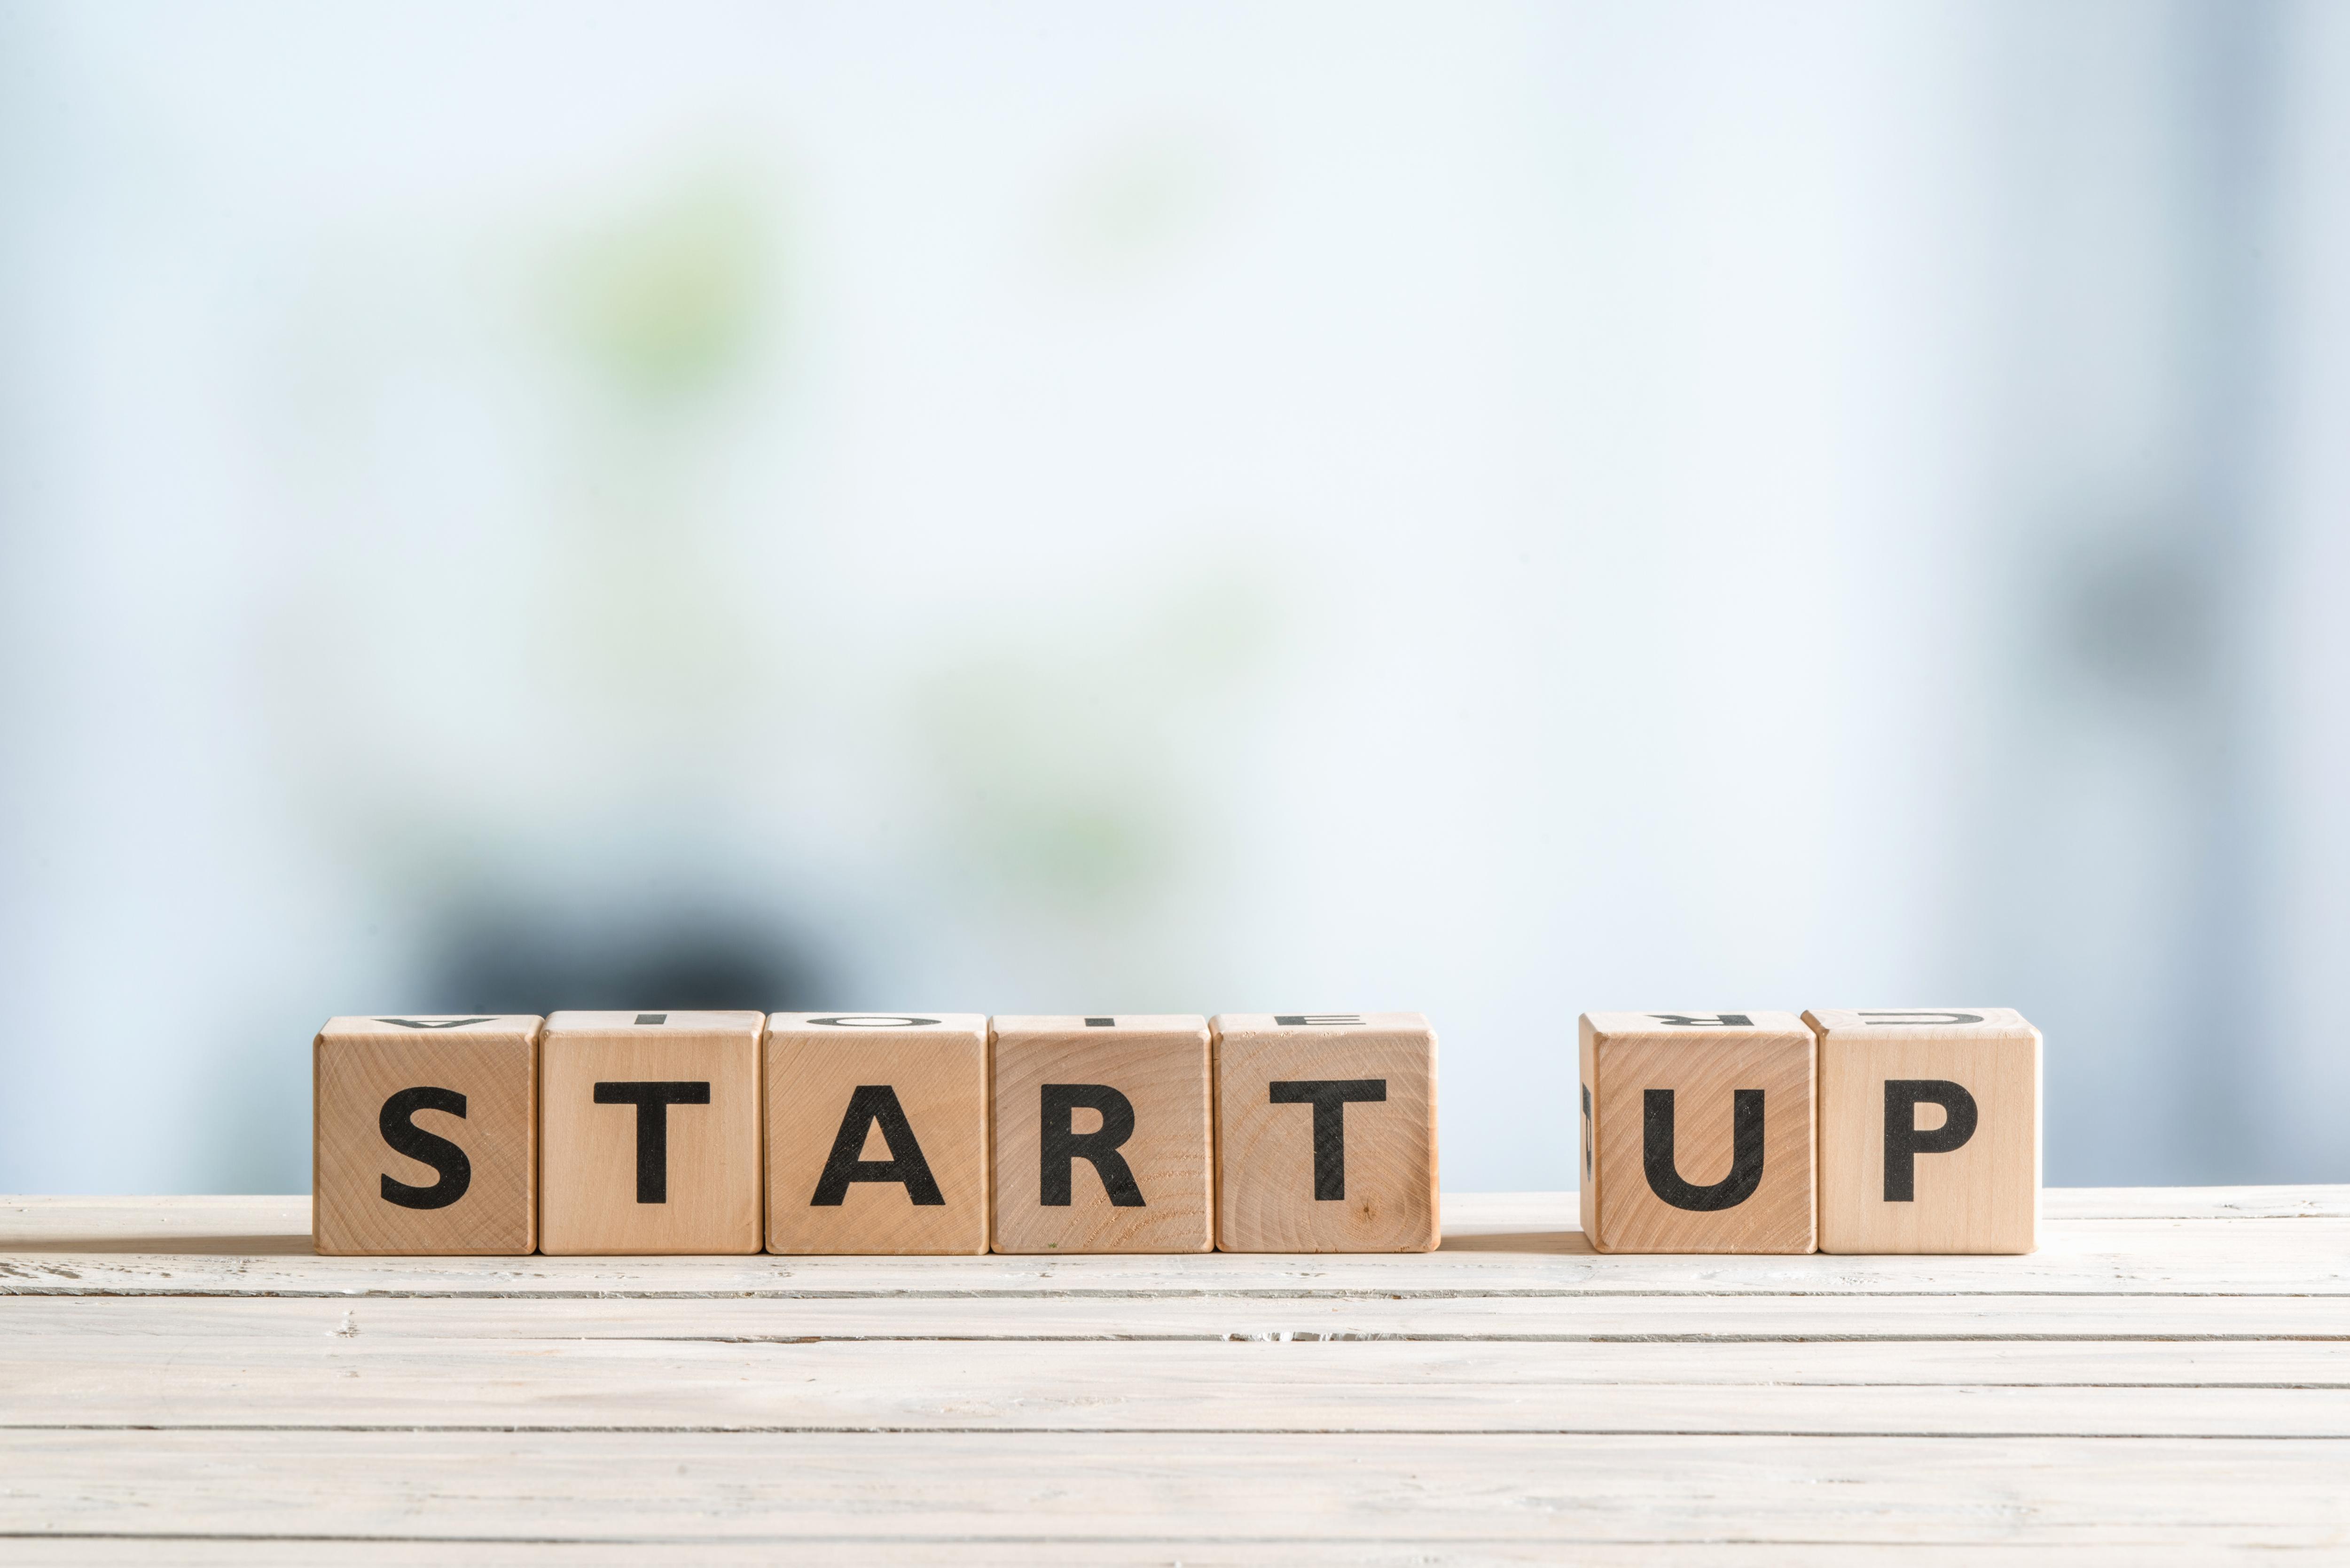 Start up 2016 nuovo bando dall idea all impresa for Idee start up 2016